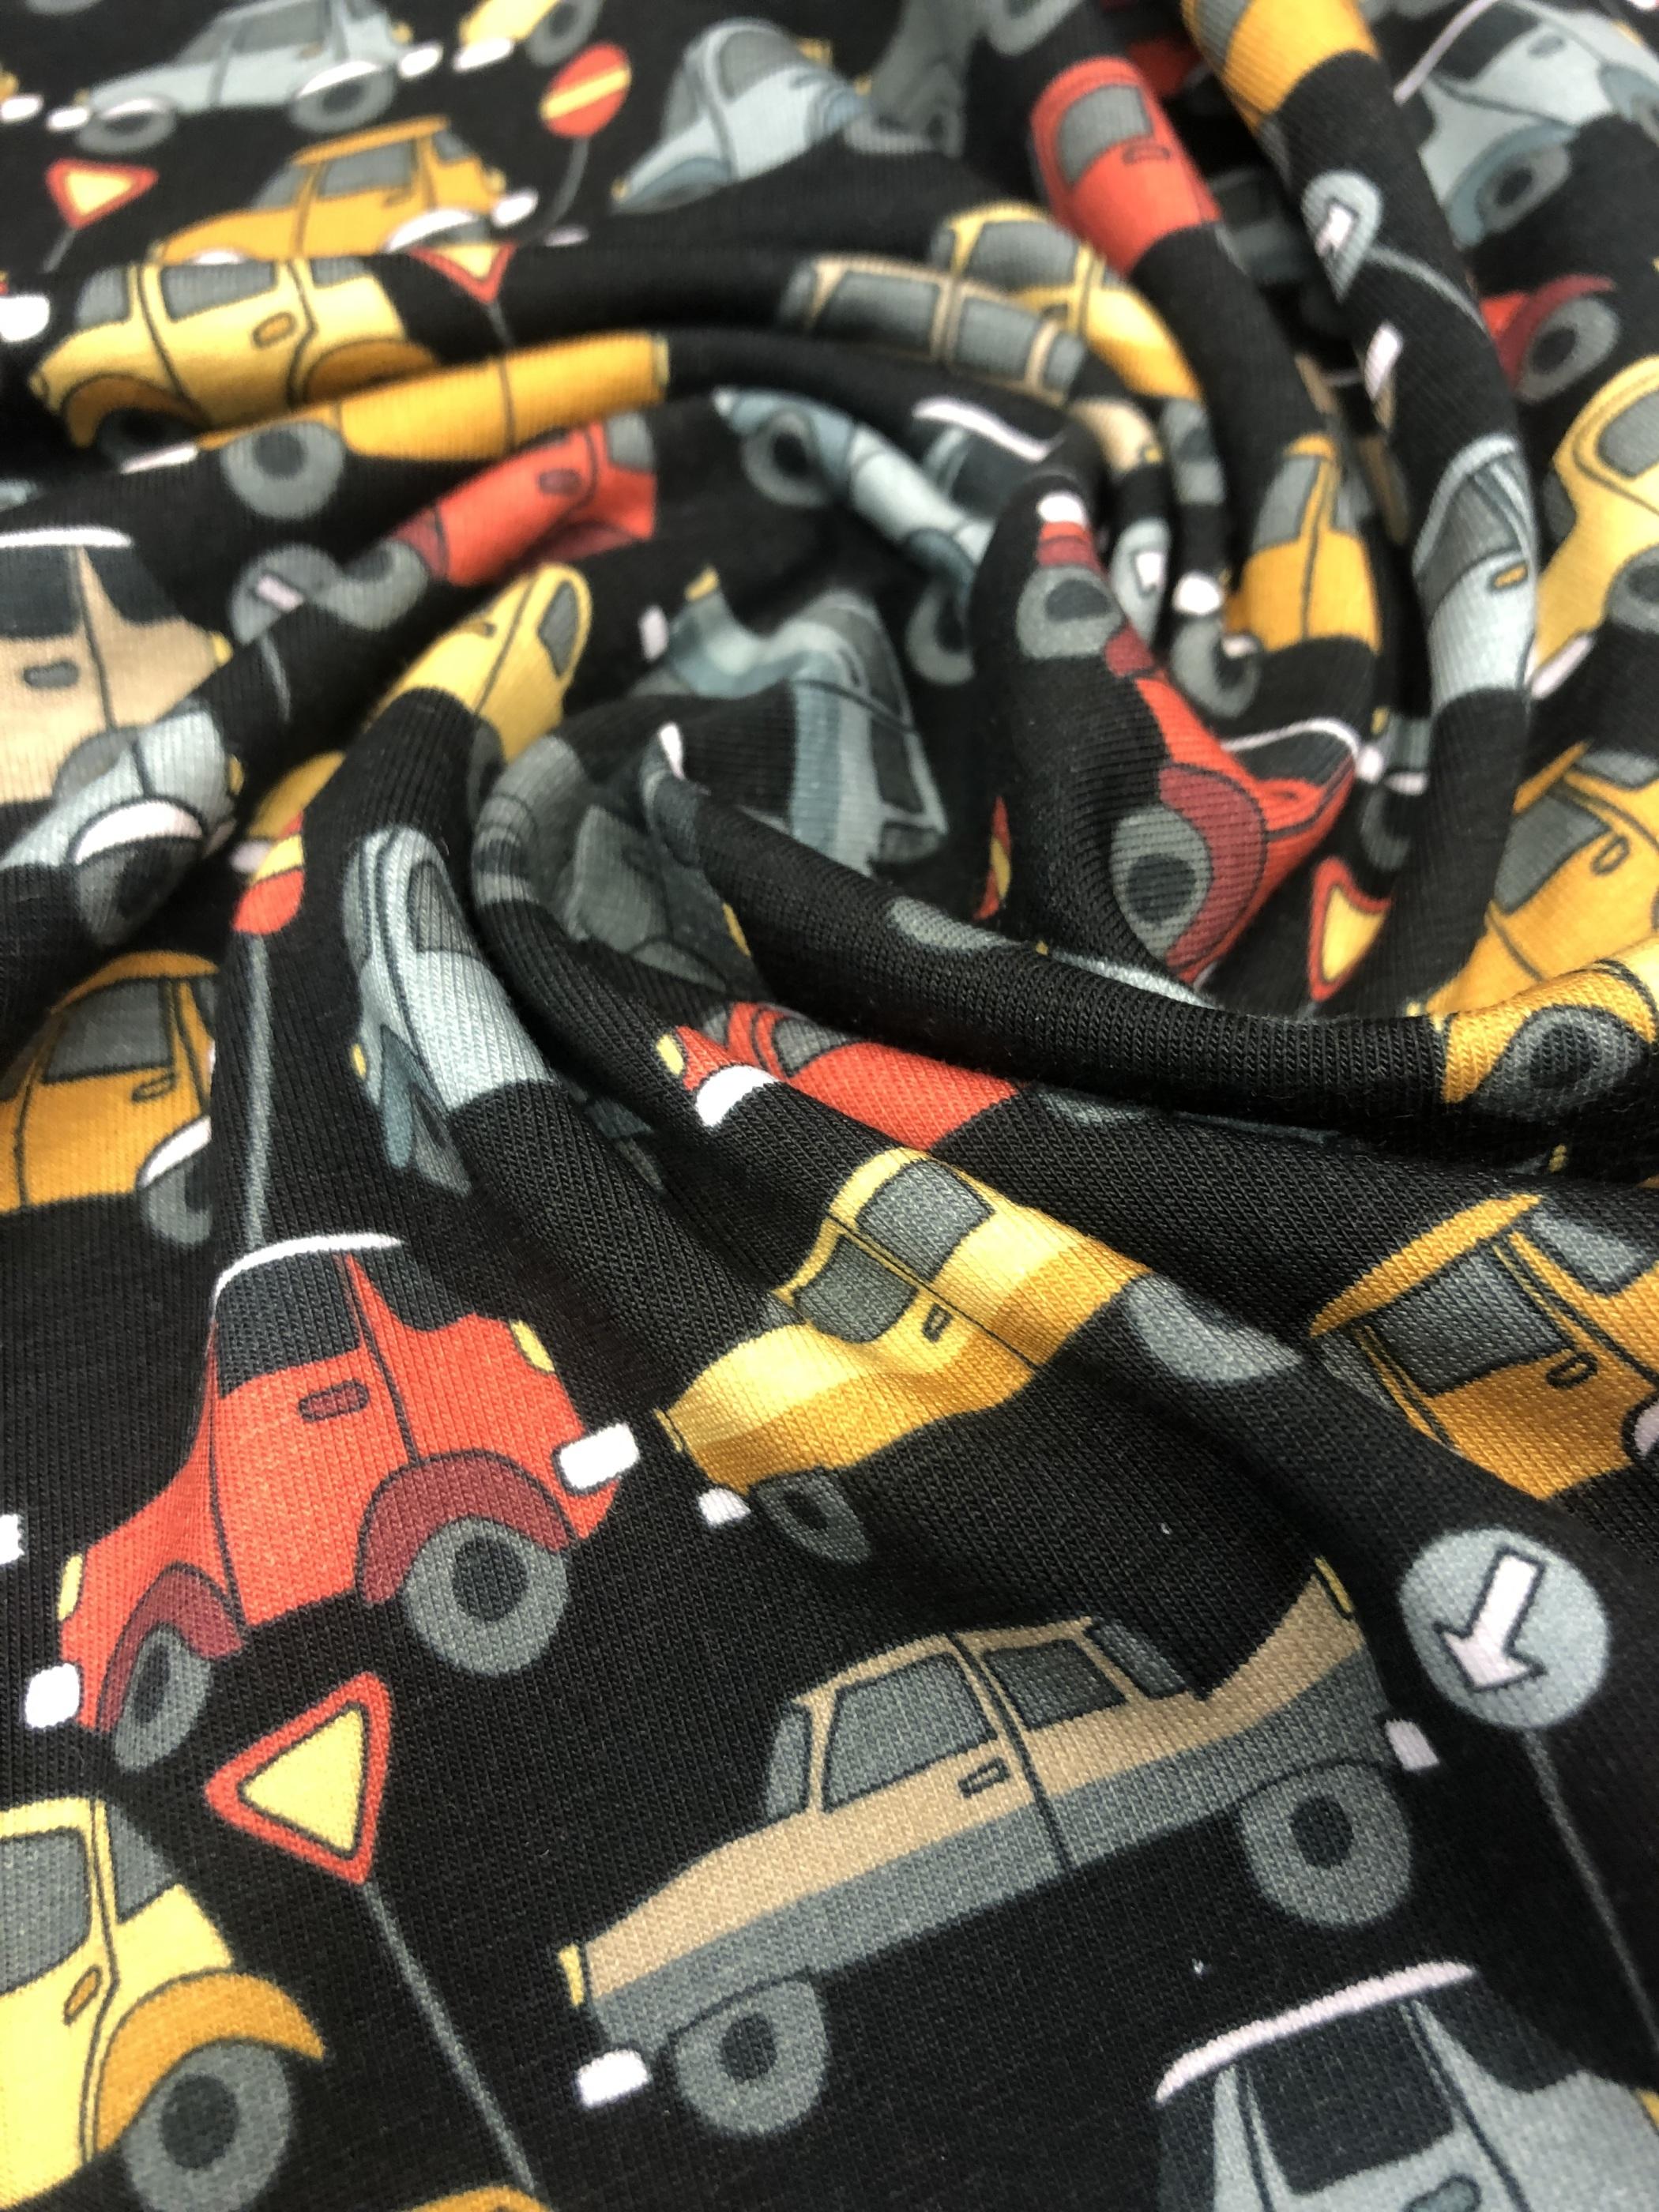 bilar trafik trafikskyltar metervara bomullstrikå trikå barntrikå barn tyglust laholm